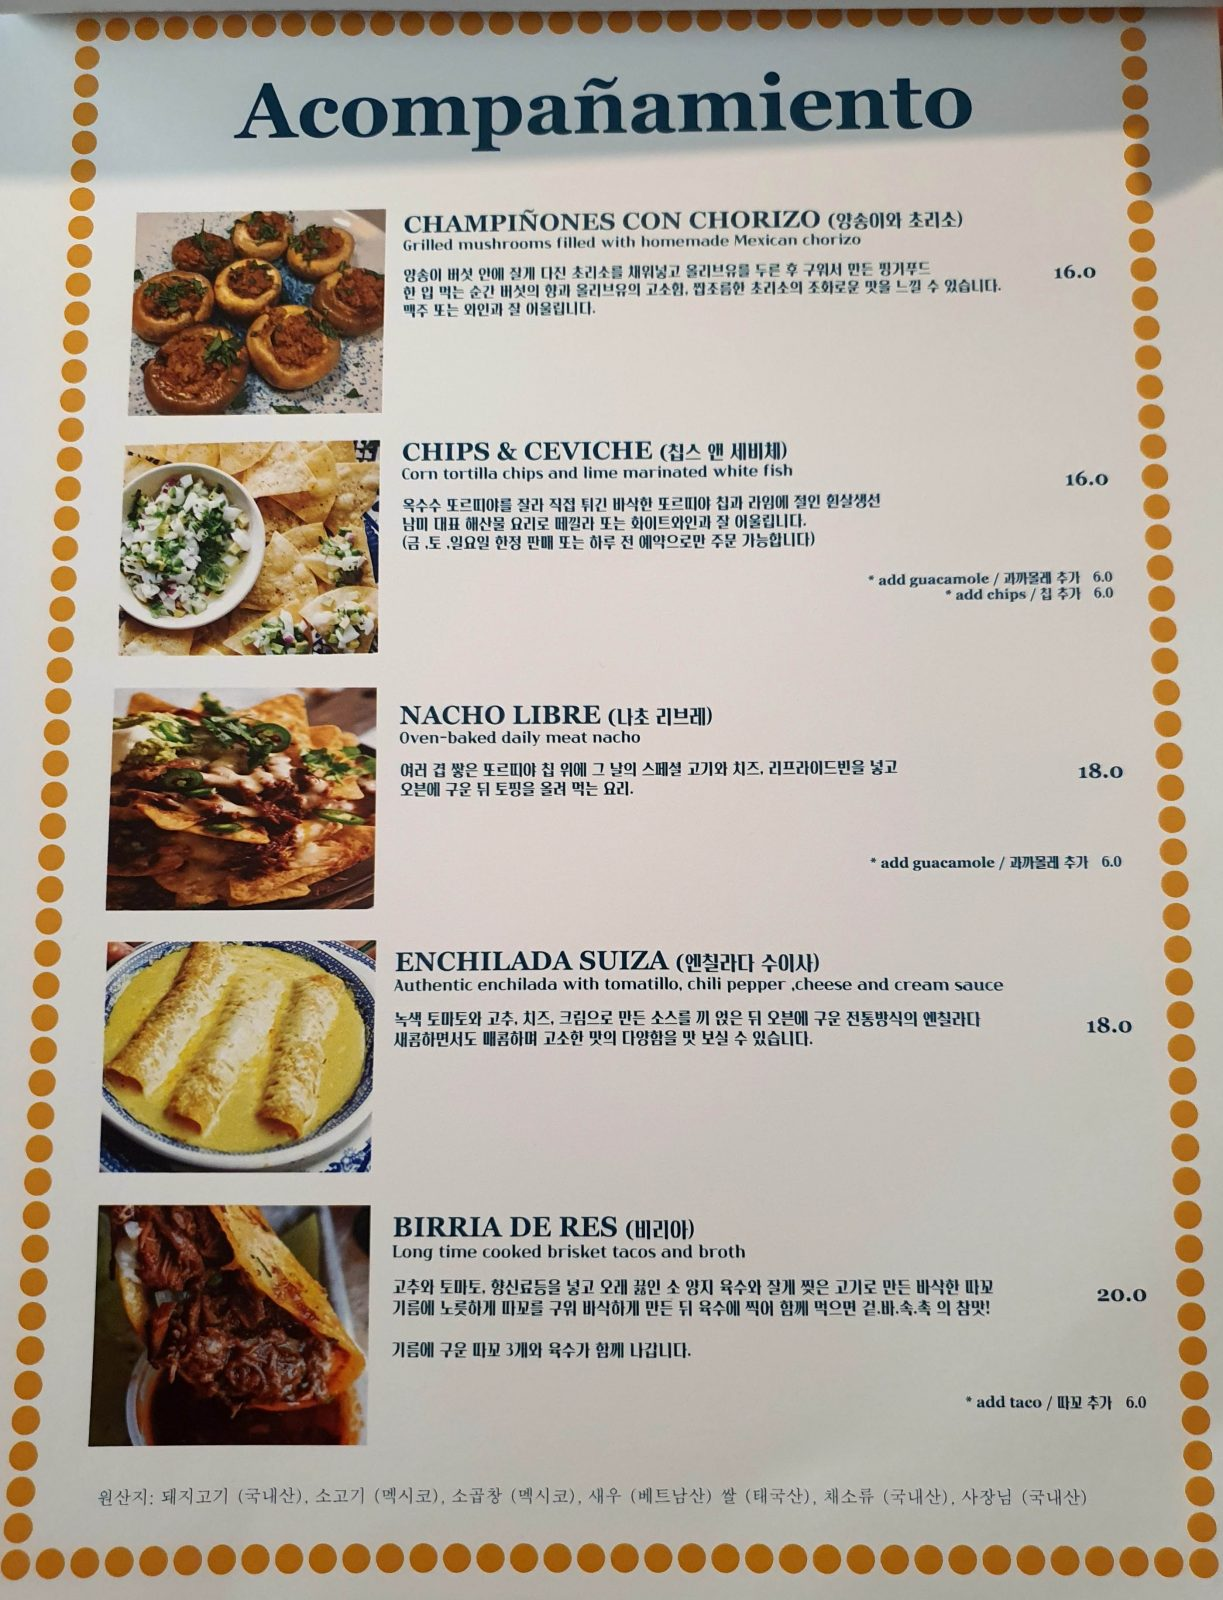 la cruda menu